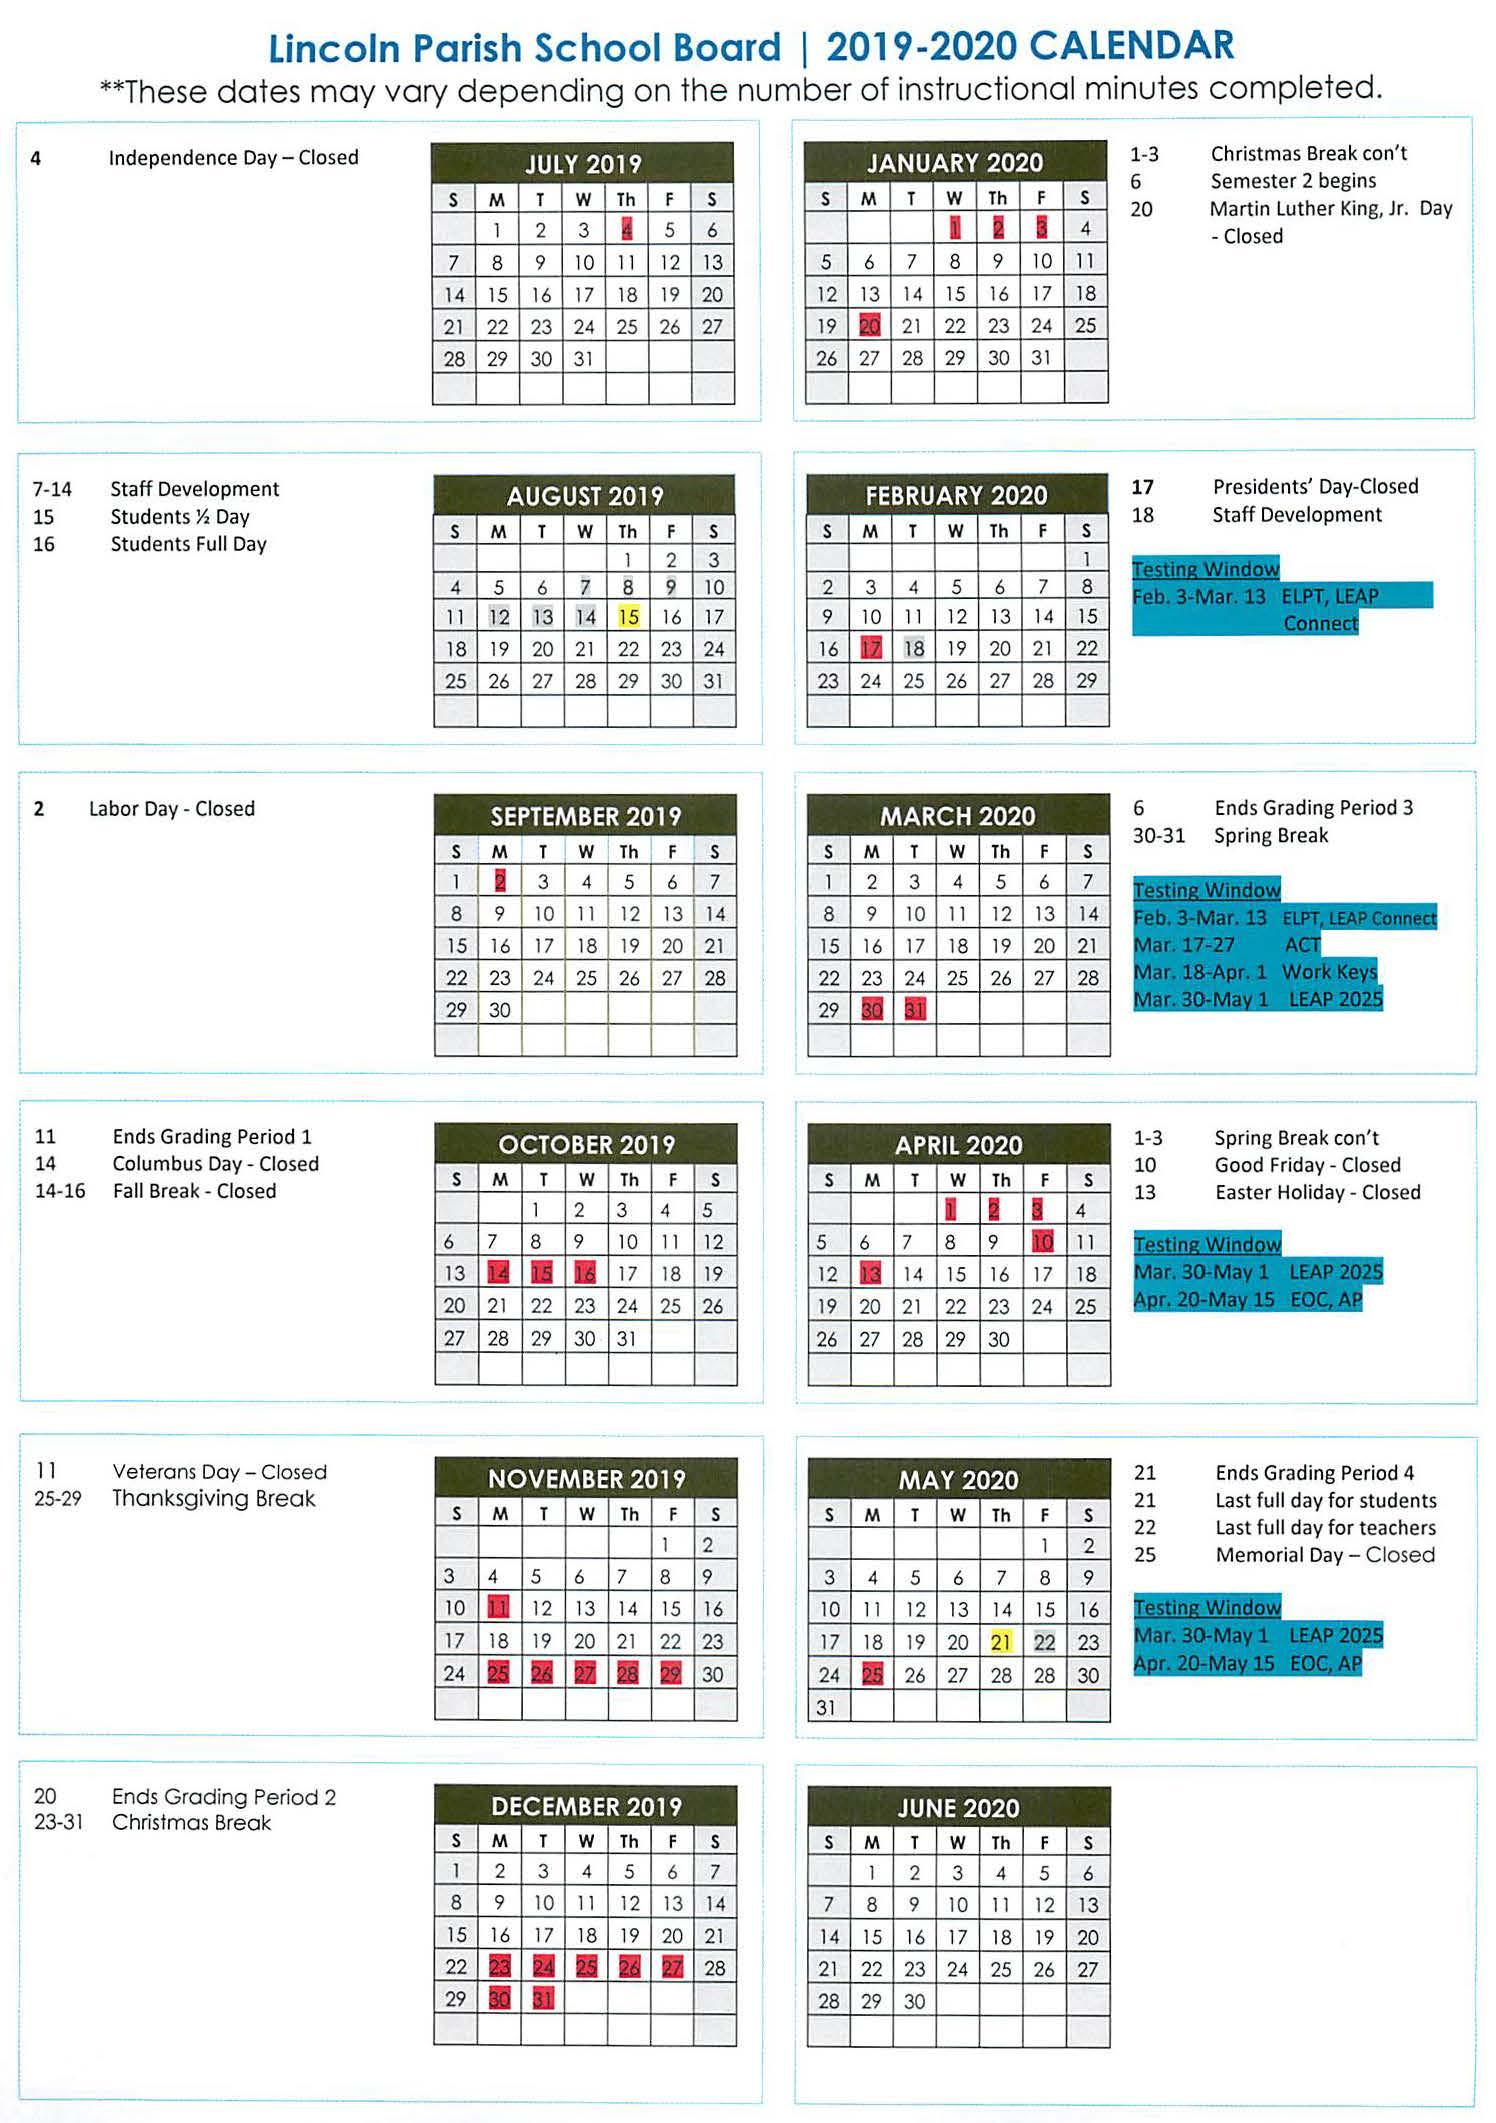 2019-2020 School Calendar Adopted | Lincoln Parish News Online with regard to Lincoln Parish School Calendar 2021 2020